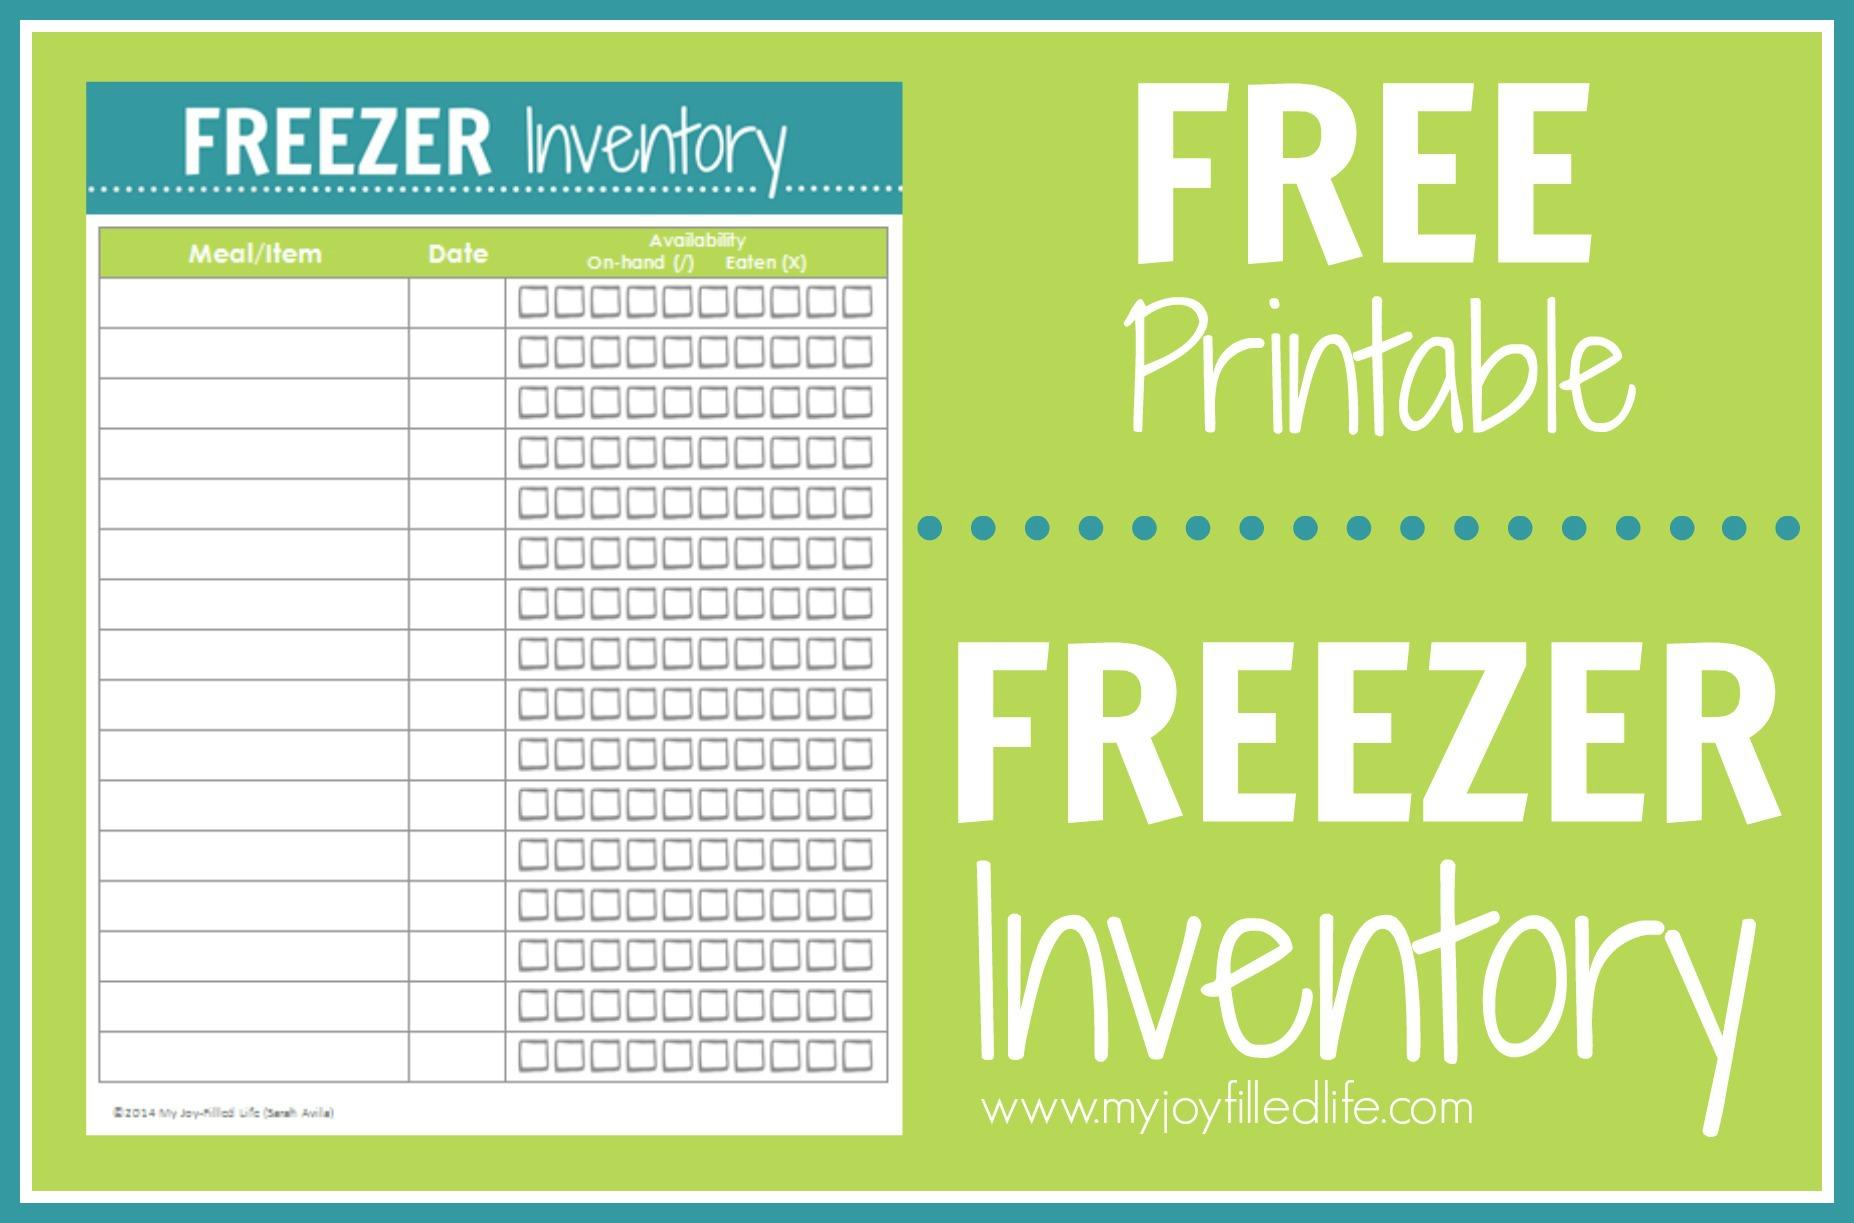 Postpartum Freezer Meals Amp Free Freezer Inventory